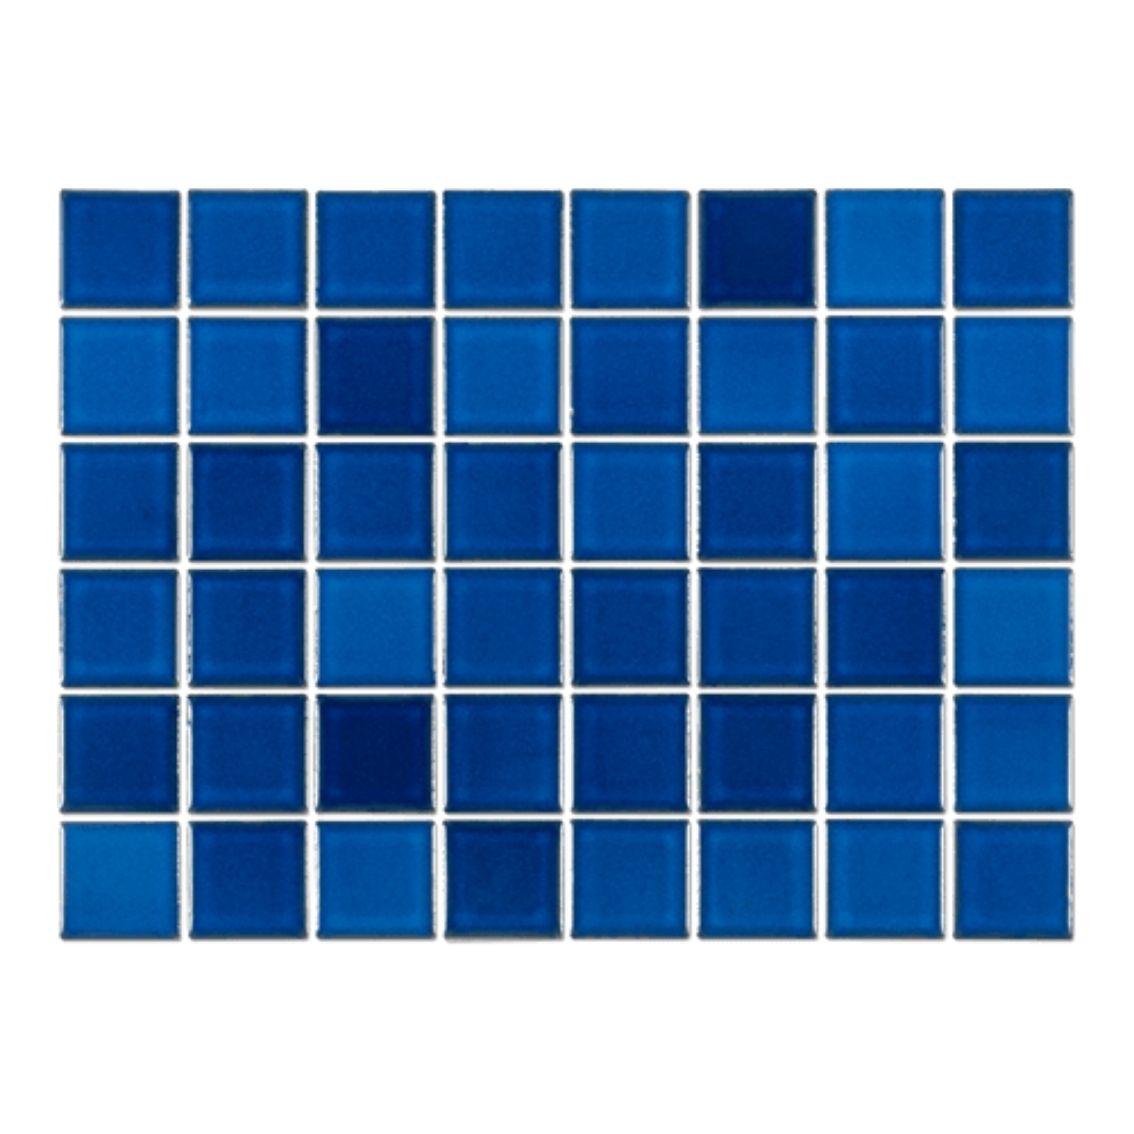 Pastilha Azul Asturias 5x5 cm <br /><b>R$ 135,00 M² </b><br />Cx 1,08 M² <b> R$ 145,80</b>